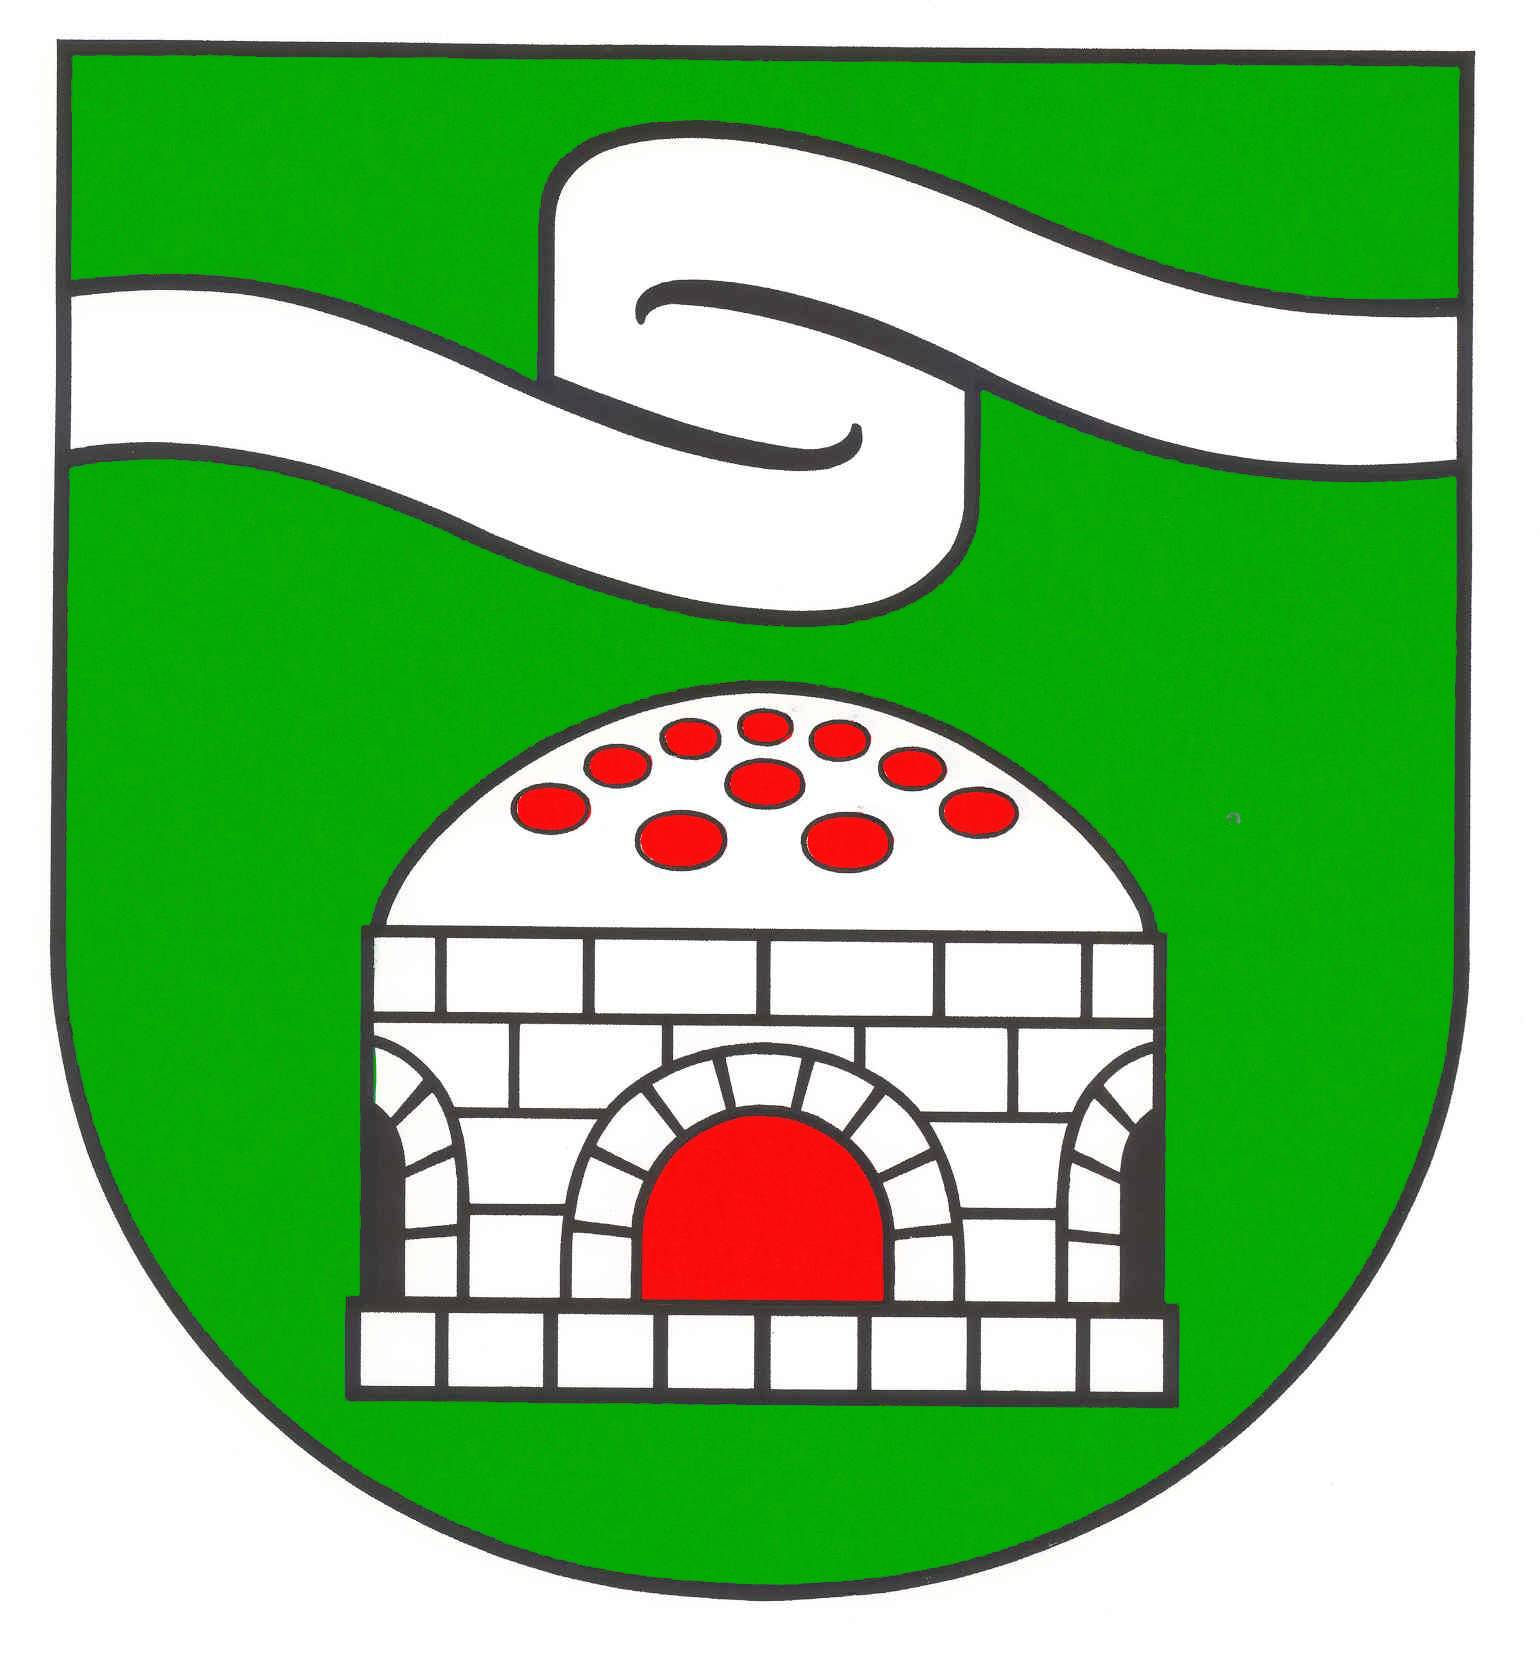 Wappen GemeindeSievershütten, Kreis Segeberg